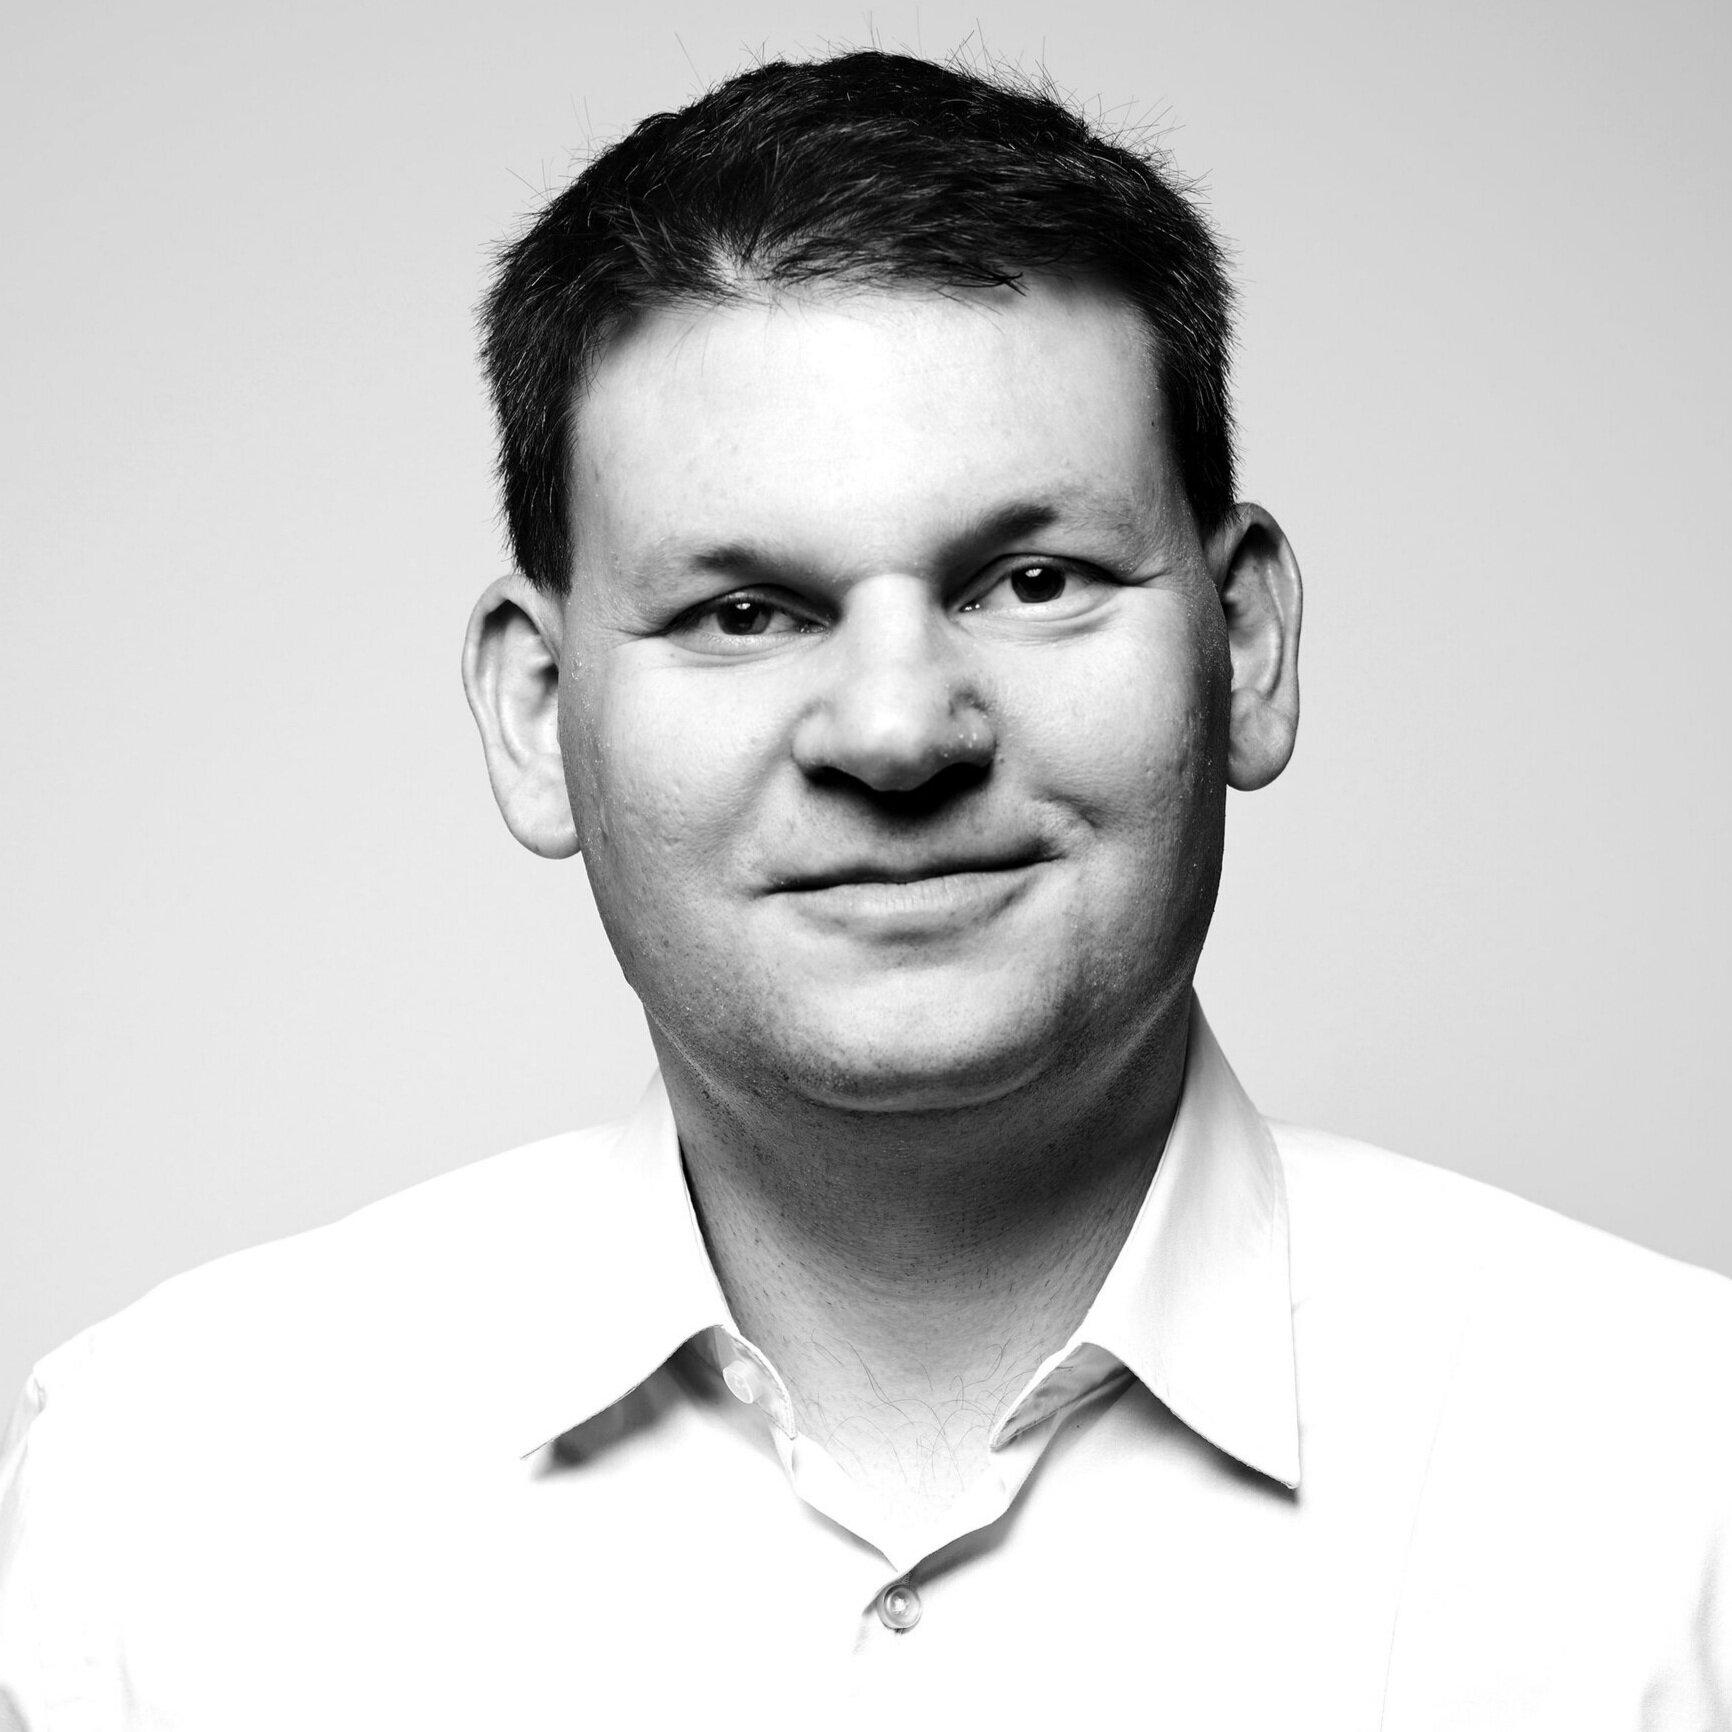 Stefan Heumann - Member of the Management Board, Stiftung Neue Verantwortung